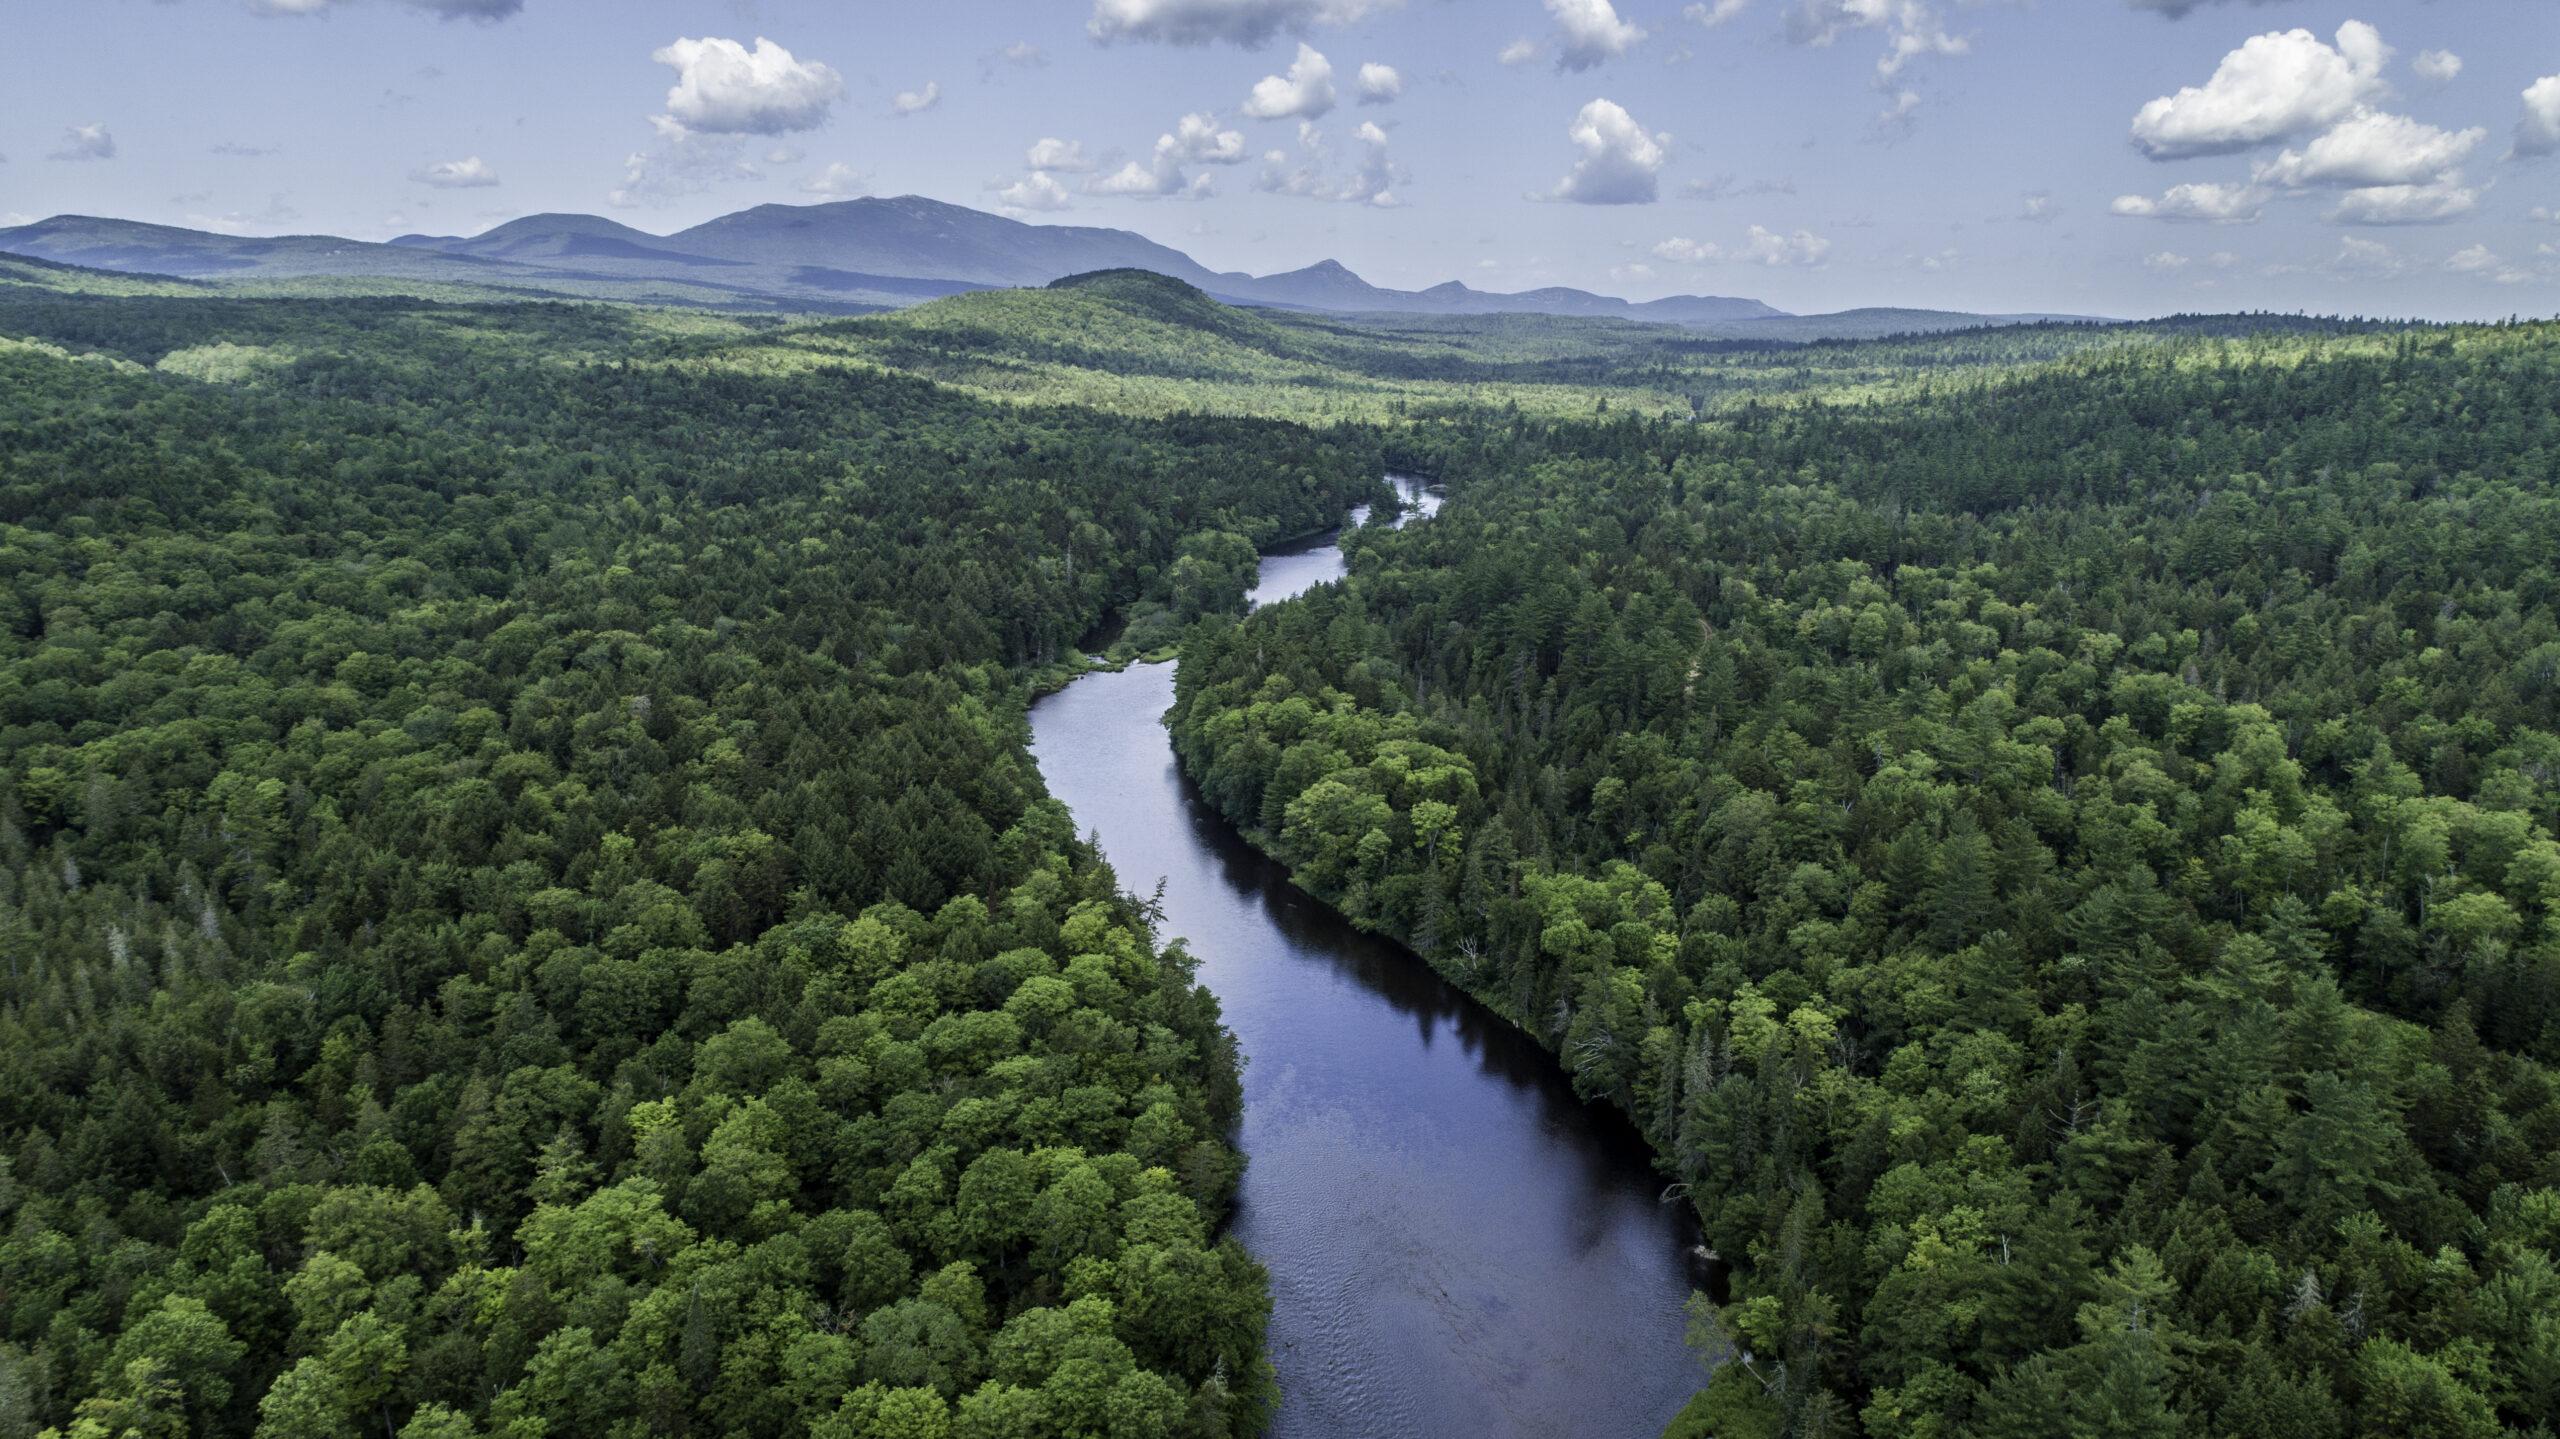 East-Branch-Penobscott-River-Patten-Maine-Altitude-300-1-1